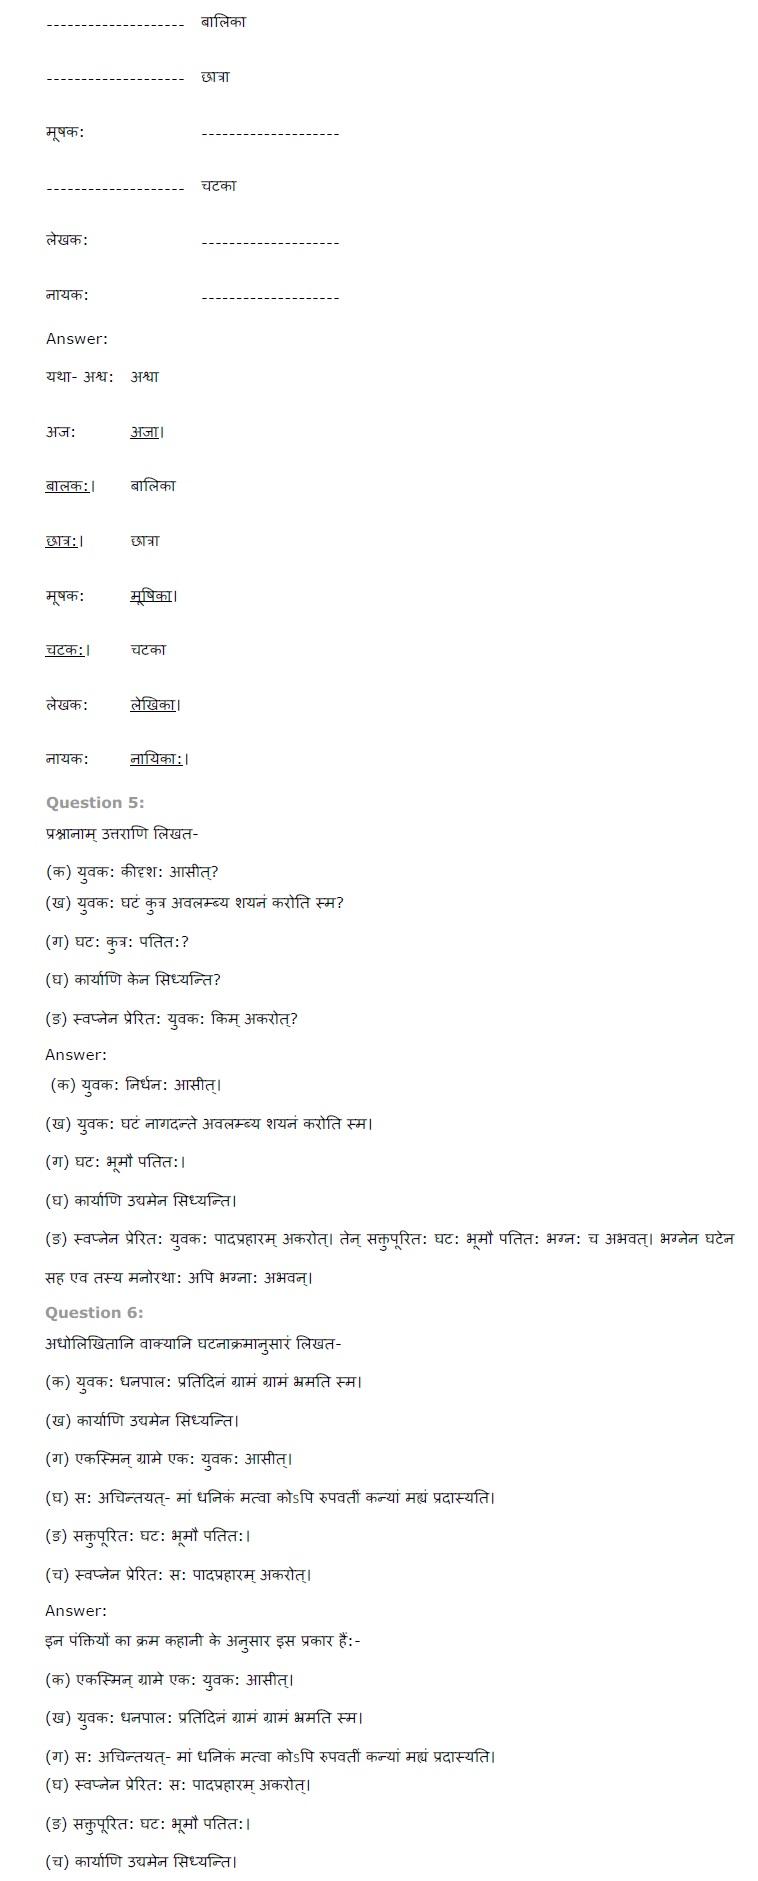 NCERT Solutions Class 6 Sanskrit Chapter 12 सोमशर्मपितु कथा